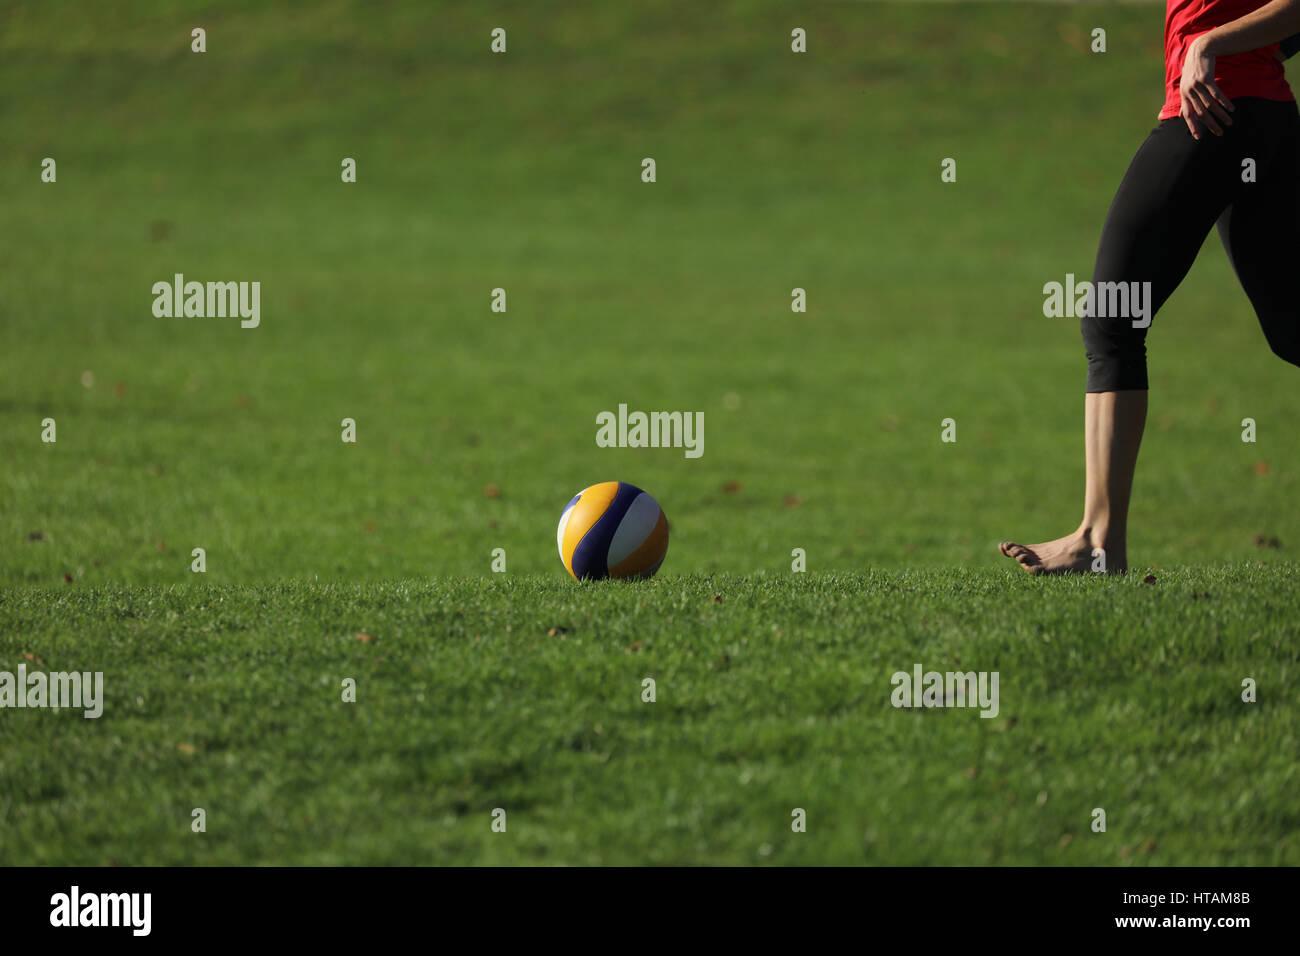 Volleyballspiel Volleyball - Stock Image